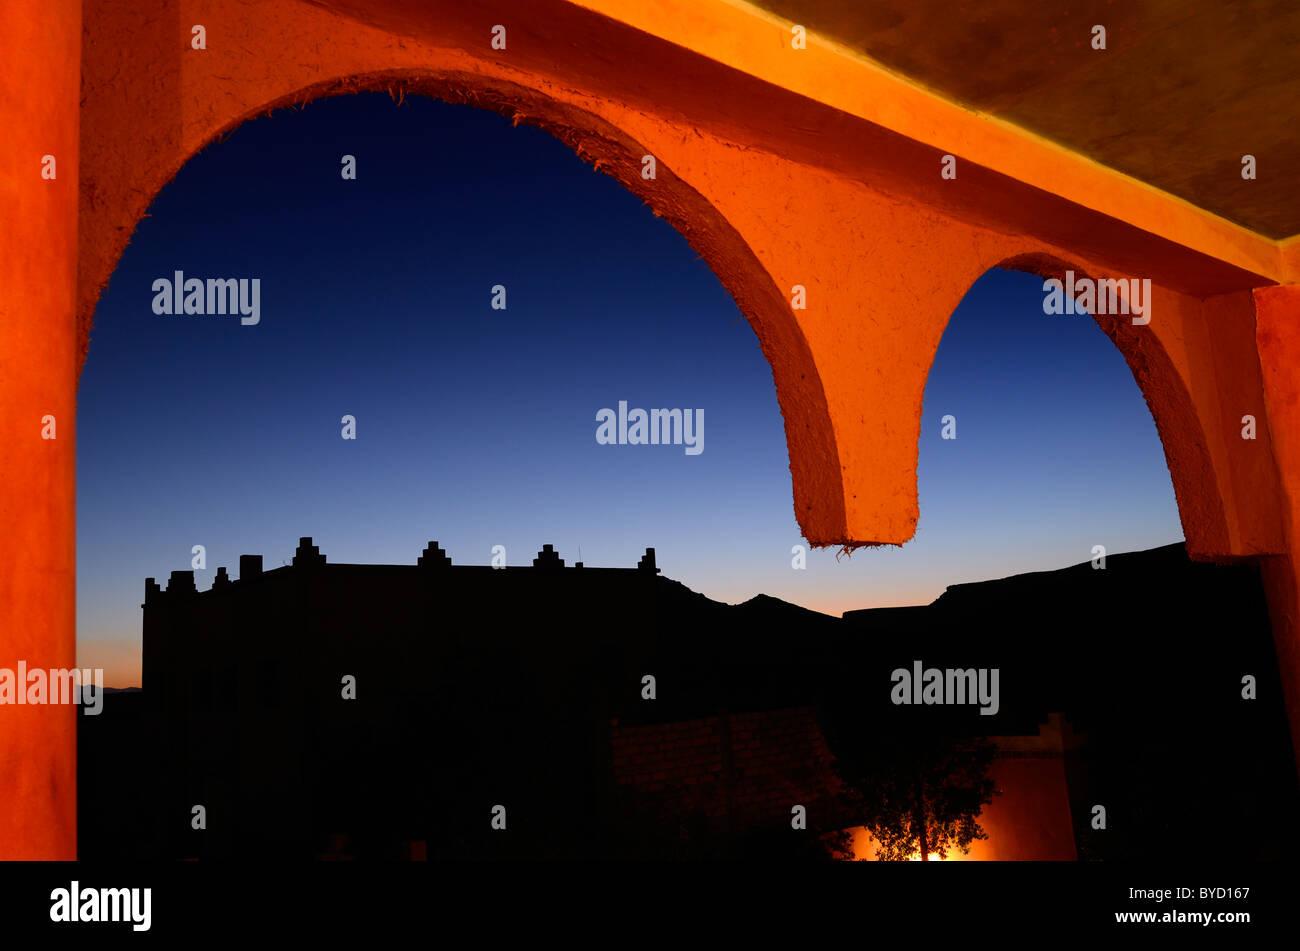 Orange adobe mud and straw resort arches with indigo sunset in Tinerhir Morocco - Stock Image